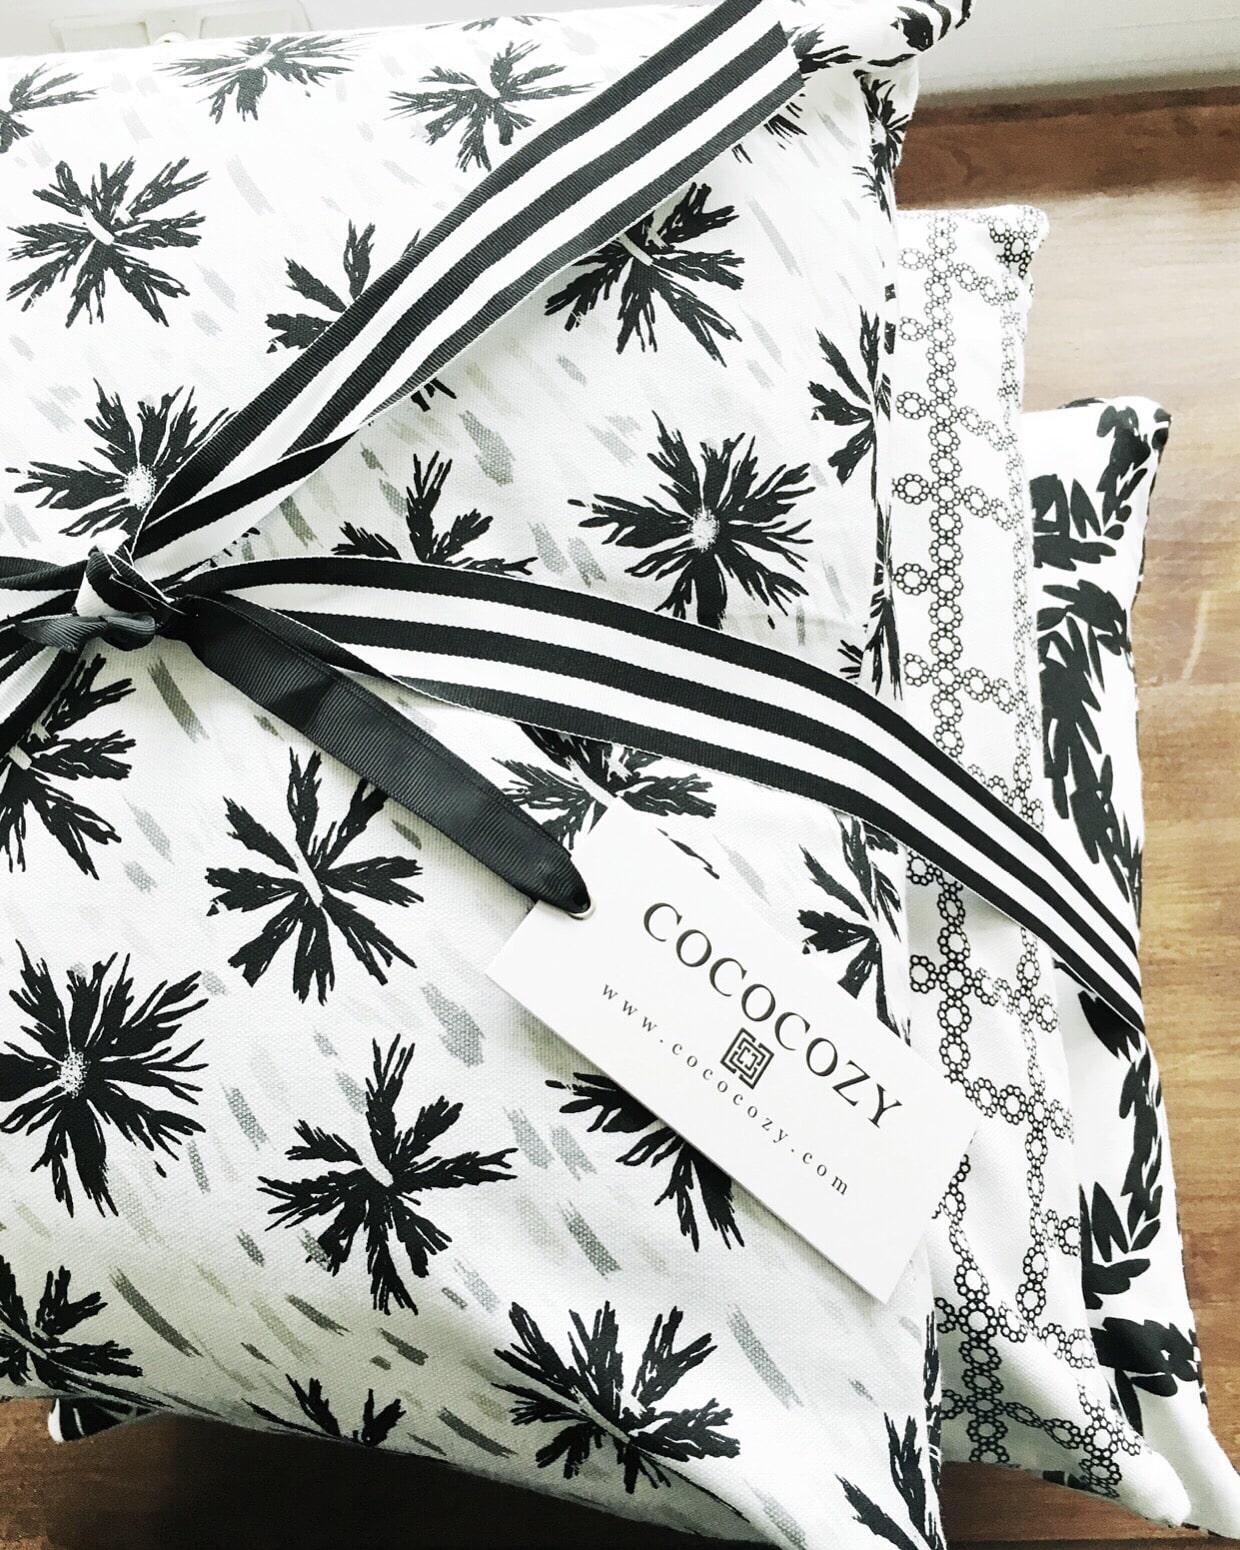 Black white Cococozy pillows